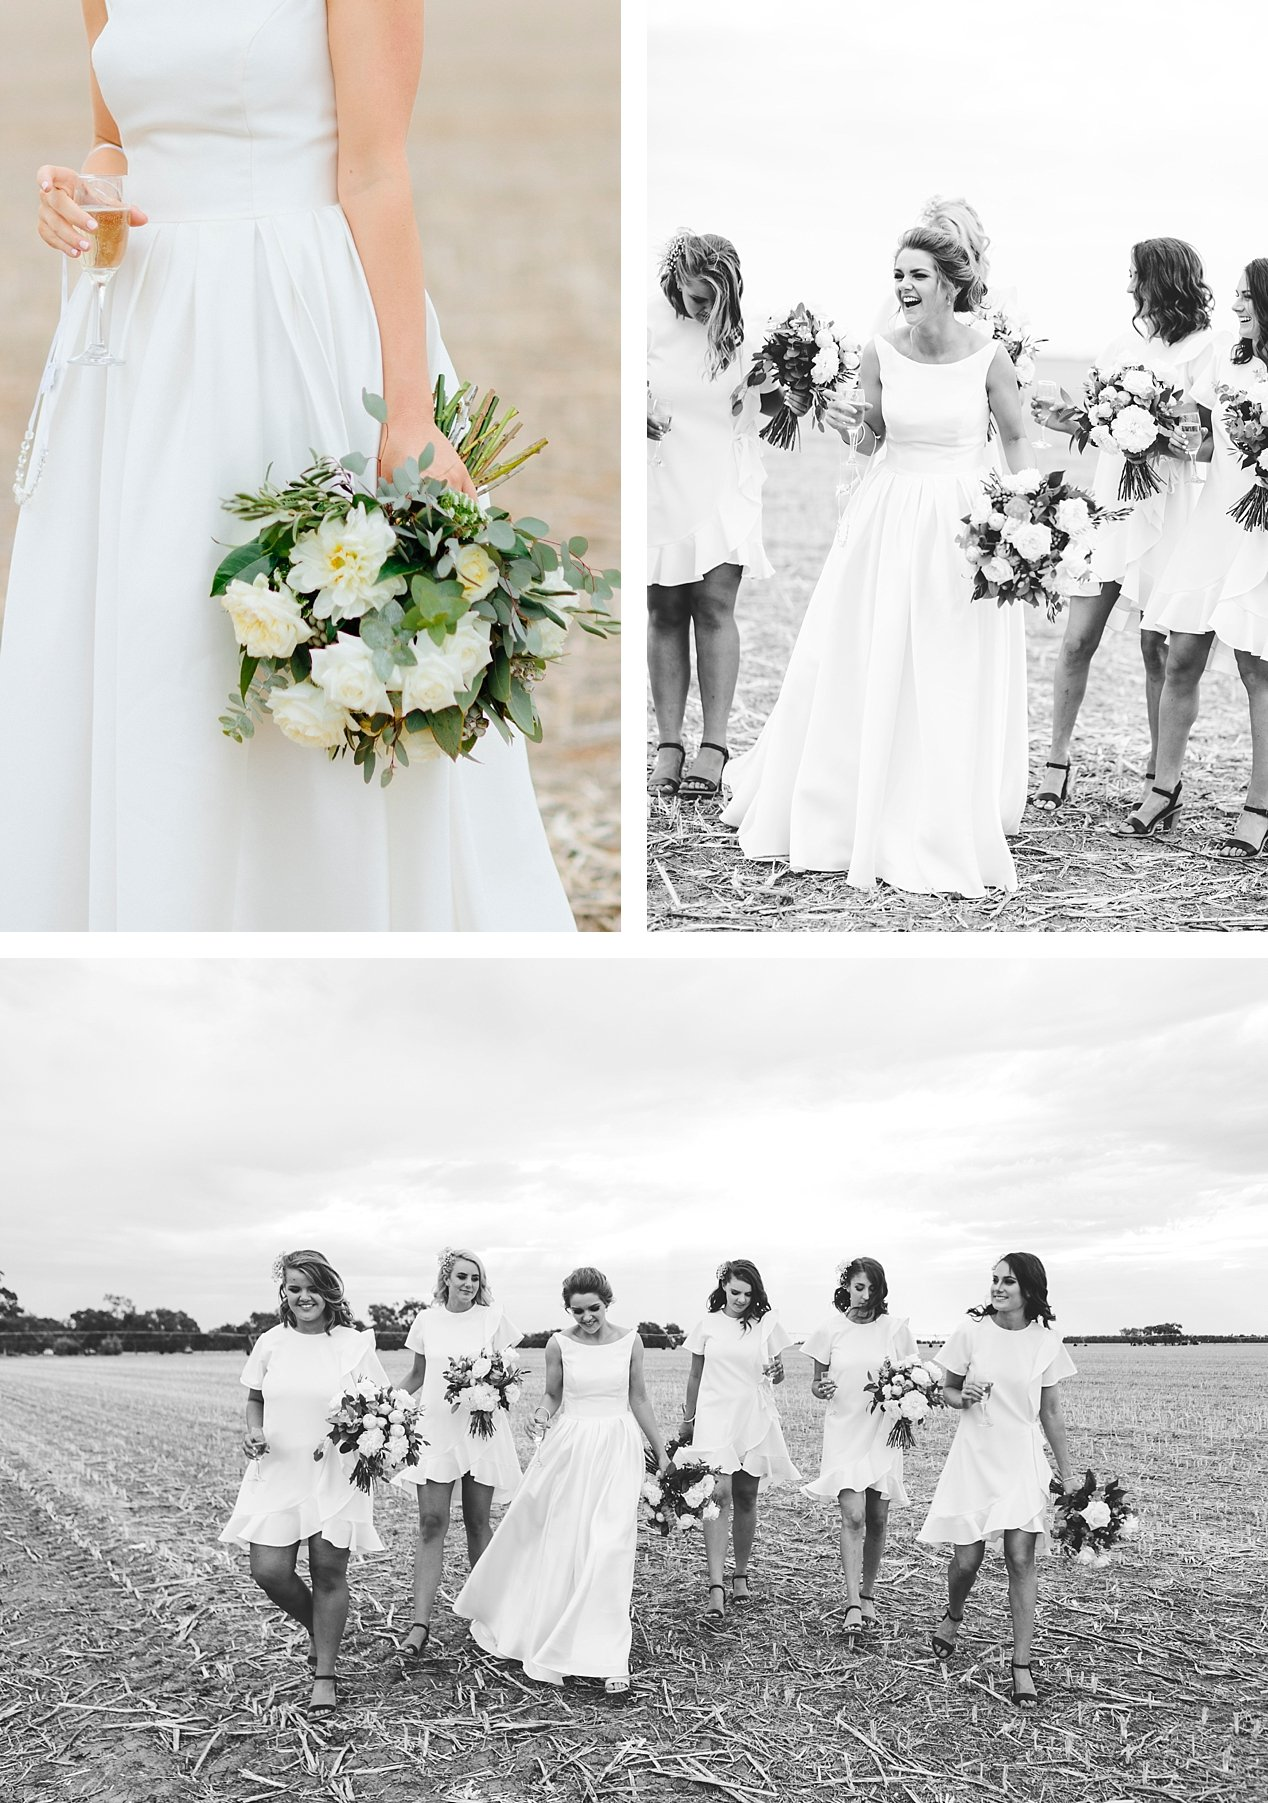 Jerilderie Wedding by Wagga Wagga Wedding Photographer Peppermint Studios_Deniliquin weddings_0101